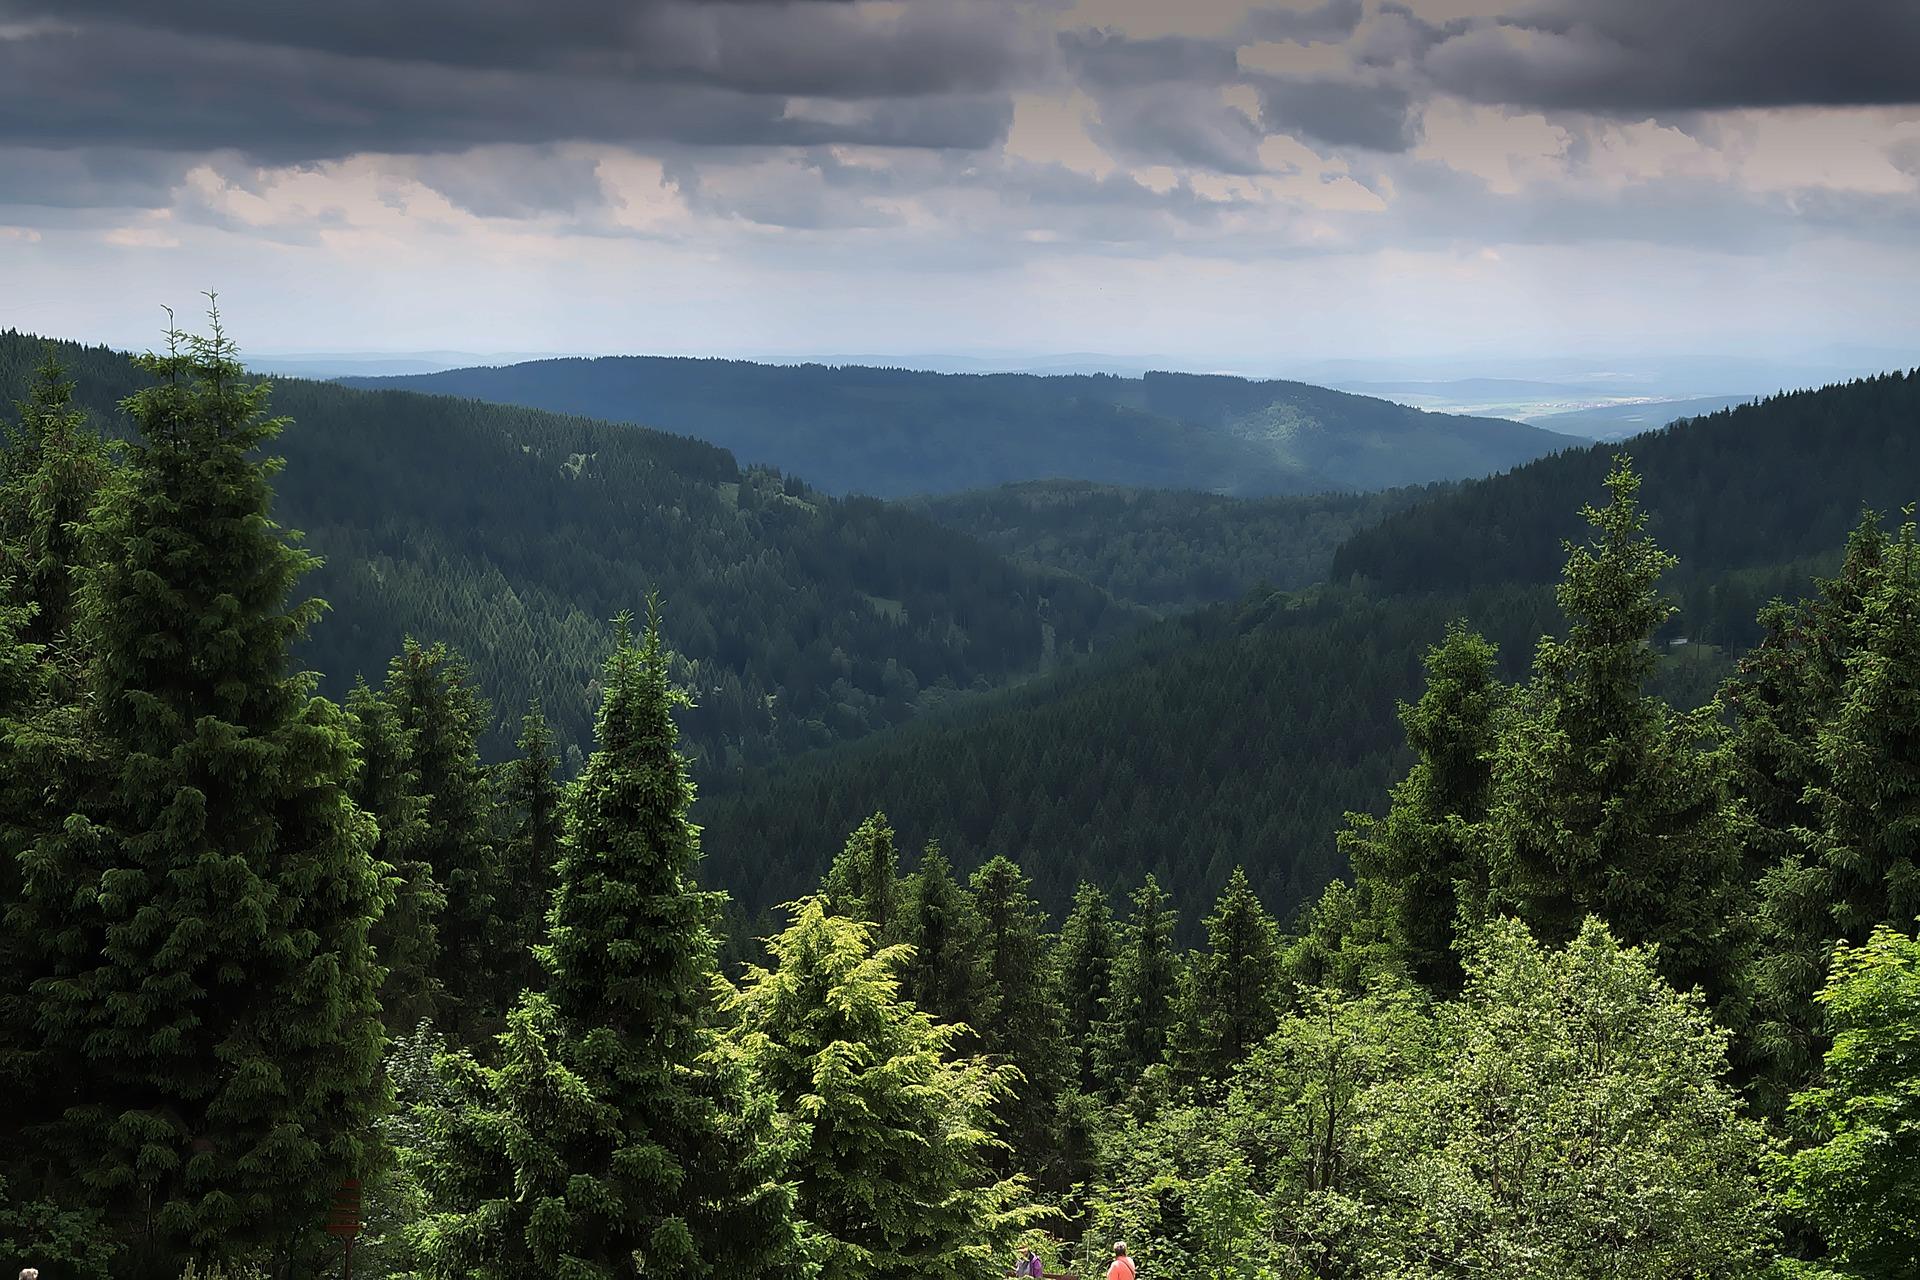 forest-2431875_1920.jpg